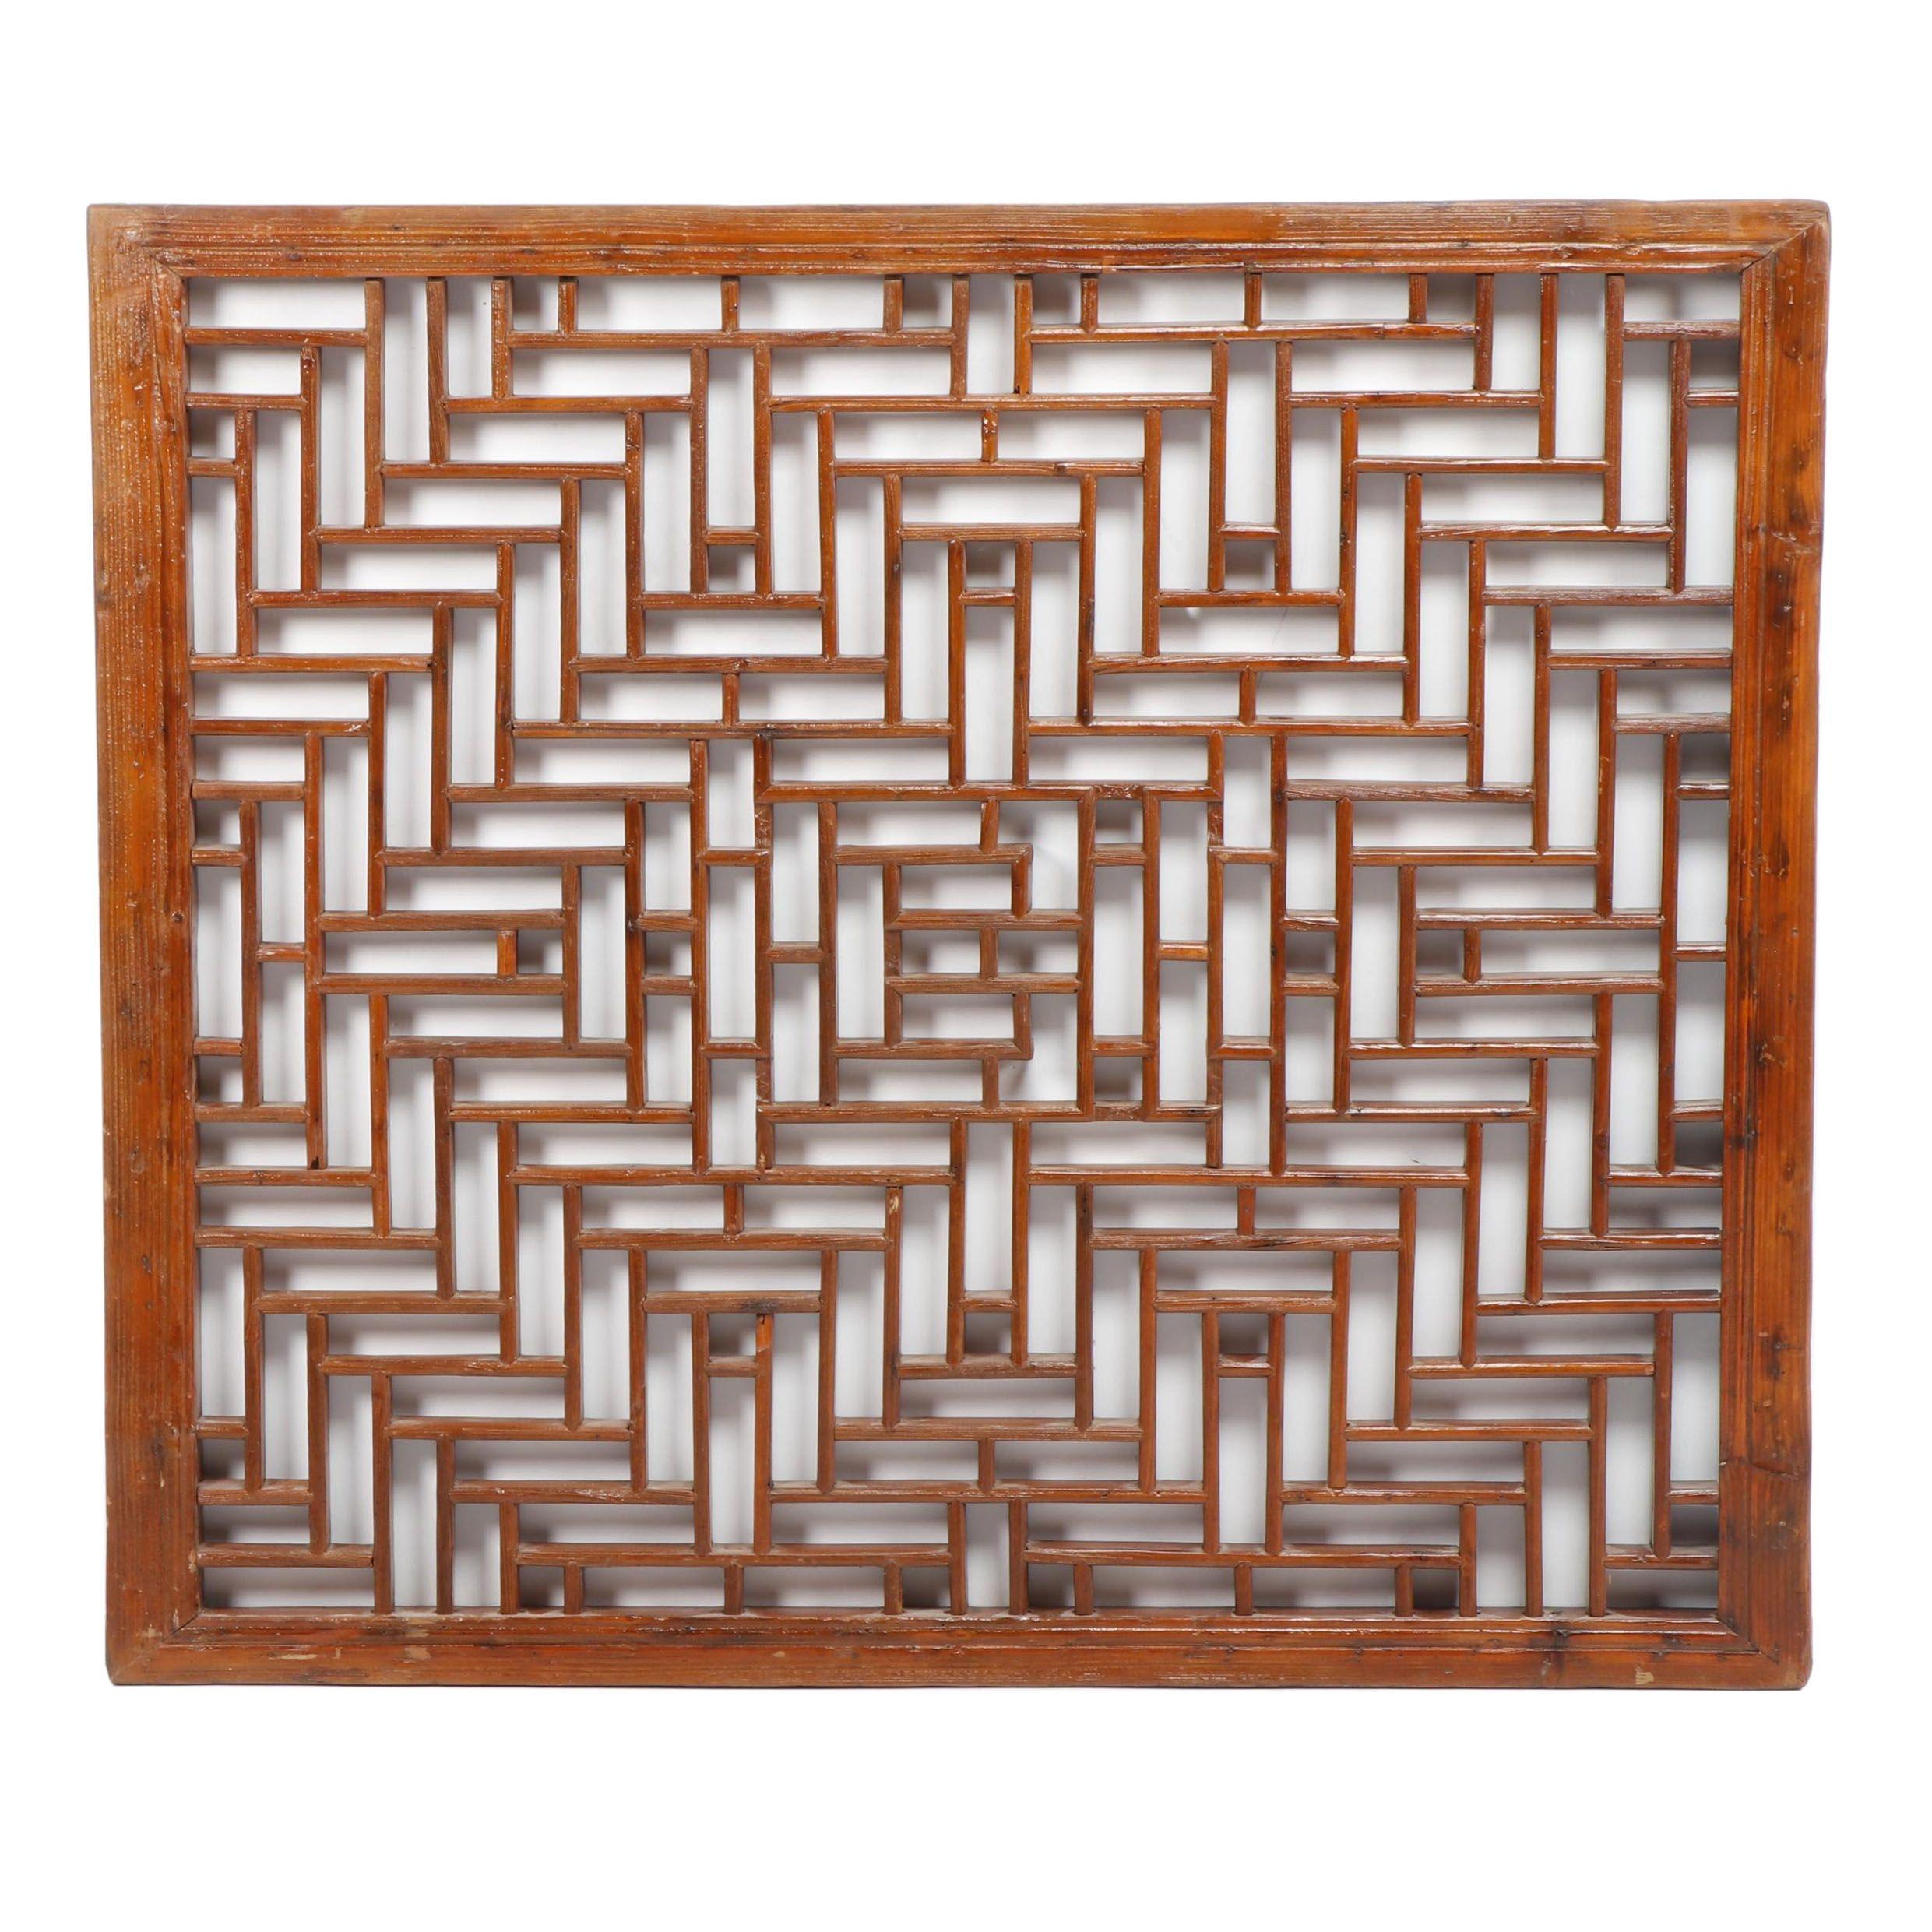 Japanese Geometric Lattice Pine Wall Hanging, Mid to Late 20th Century